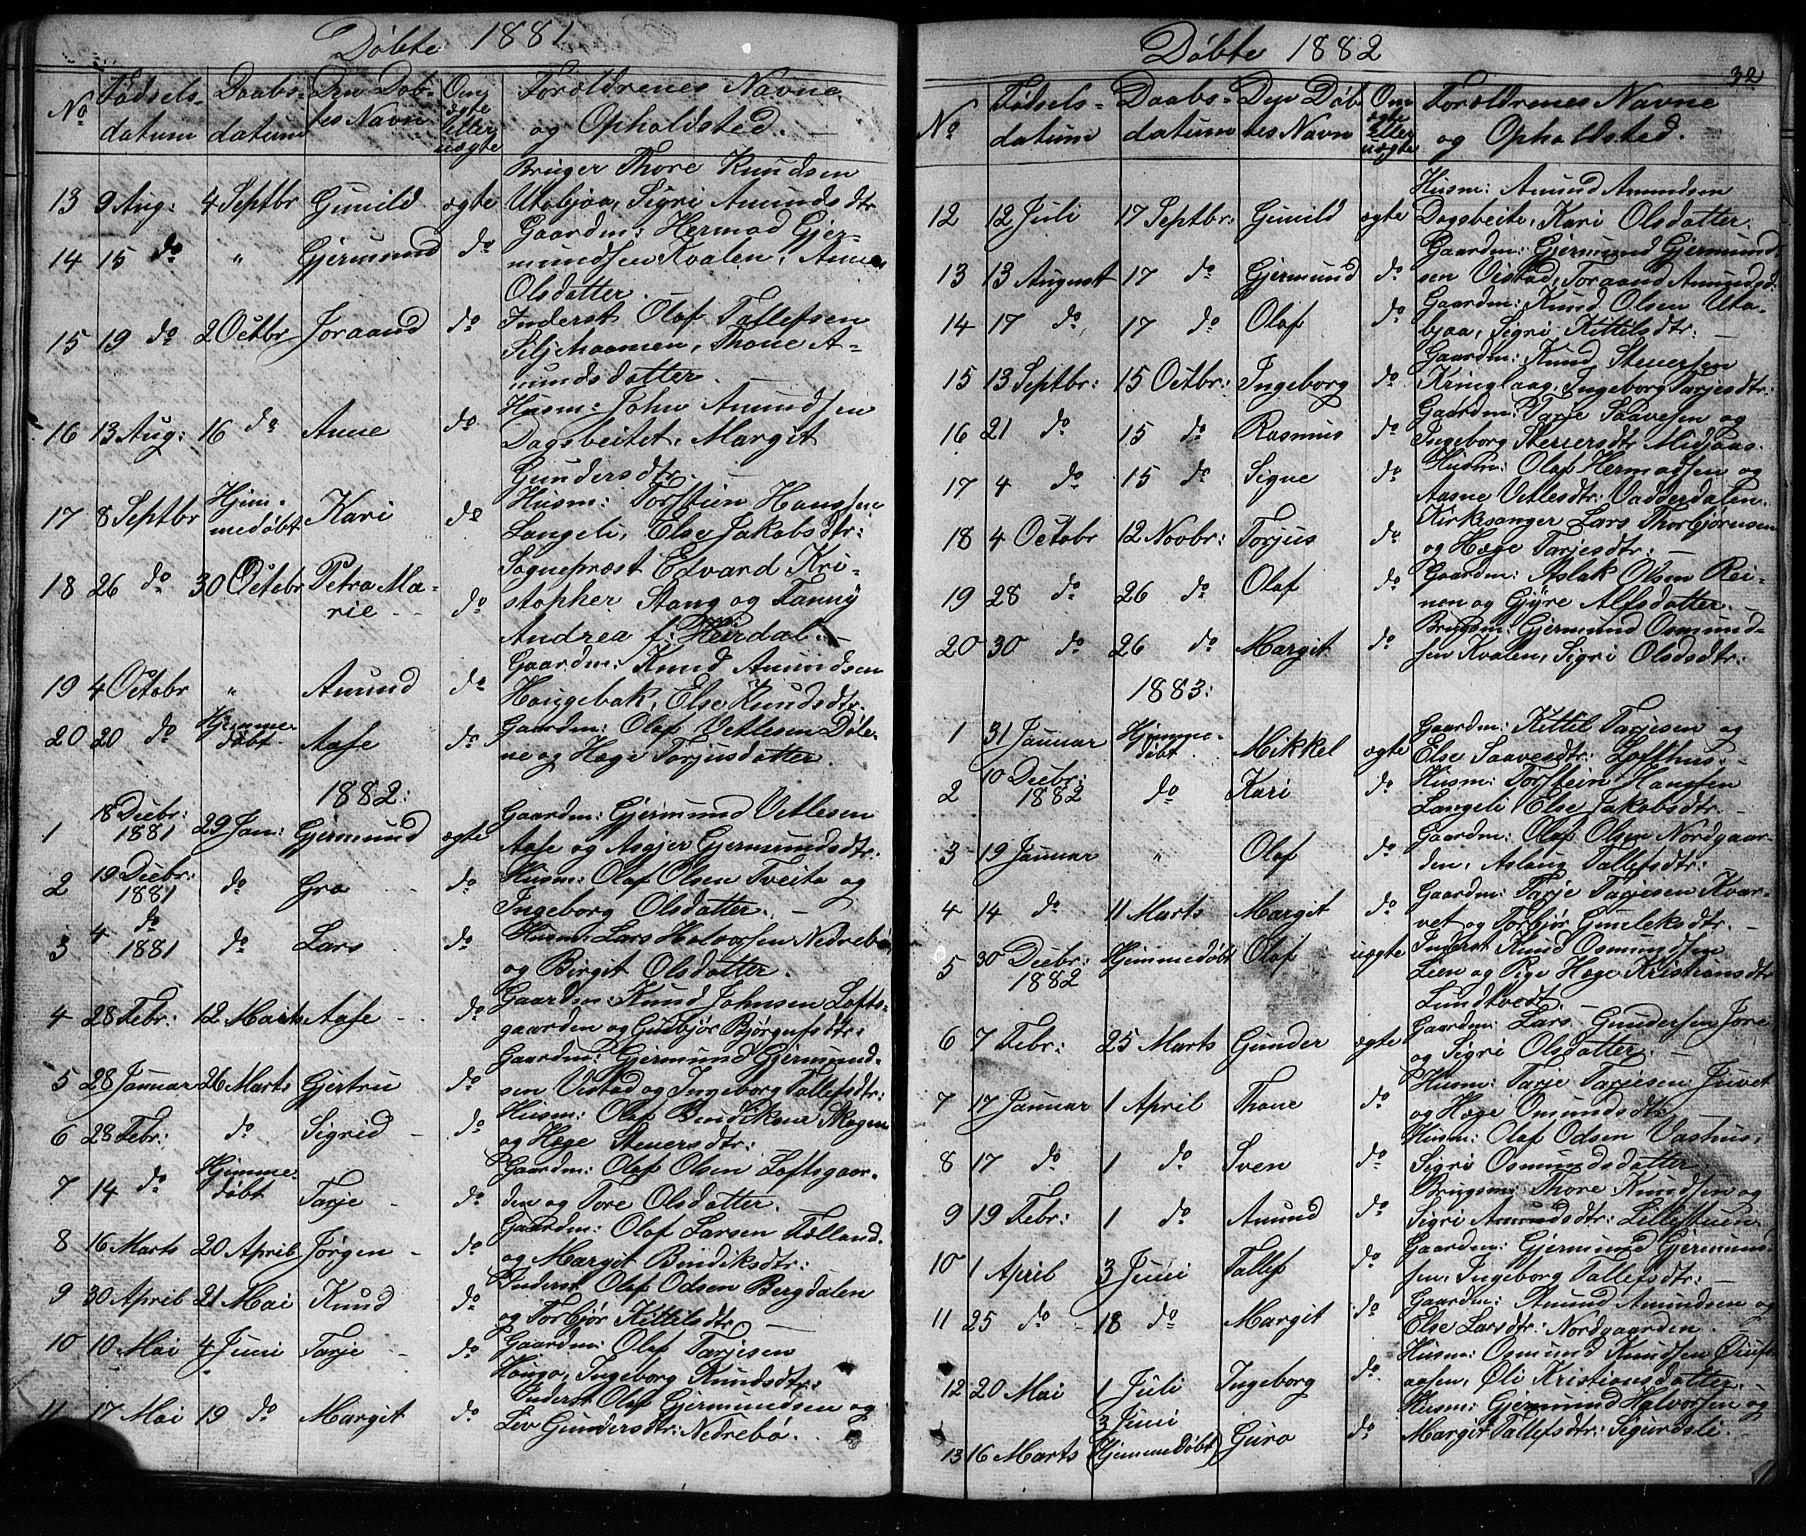 SAKO, Mo kirkebøker, G/Ga/L0001: Klokkerbok nr. I 1, 1851-1891, s. 32